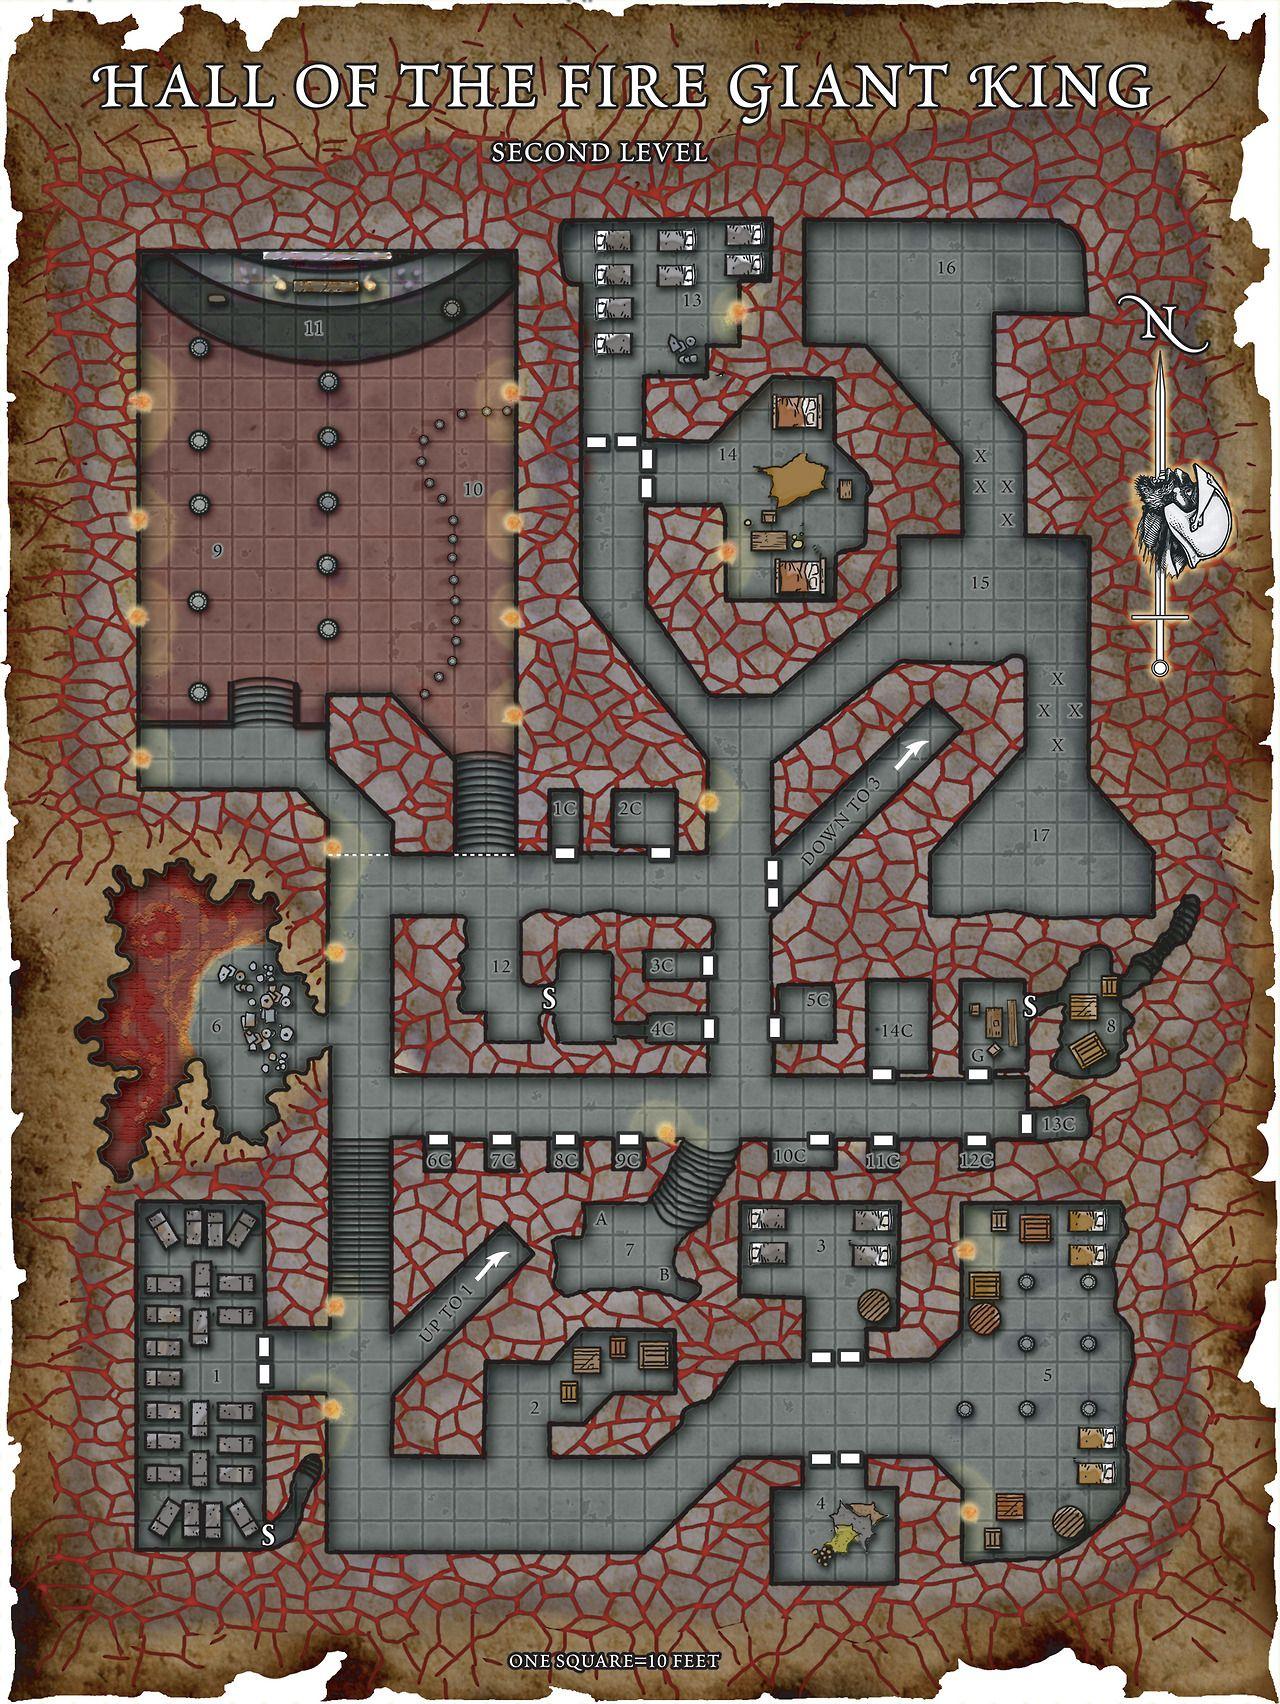 Fantasy Maps Robert Lazzaretti Hall Of Fire Giant